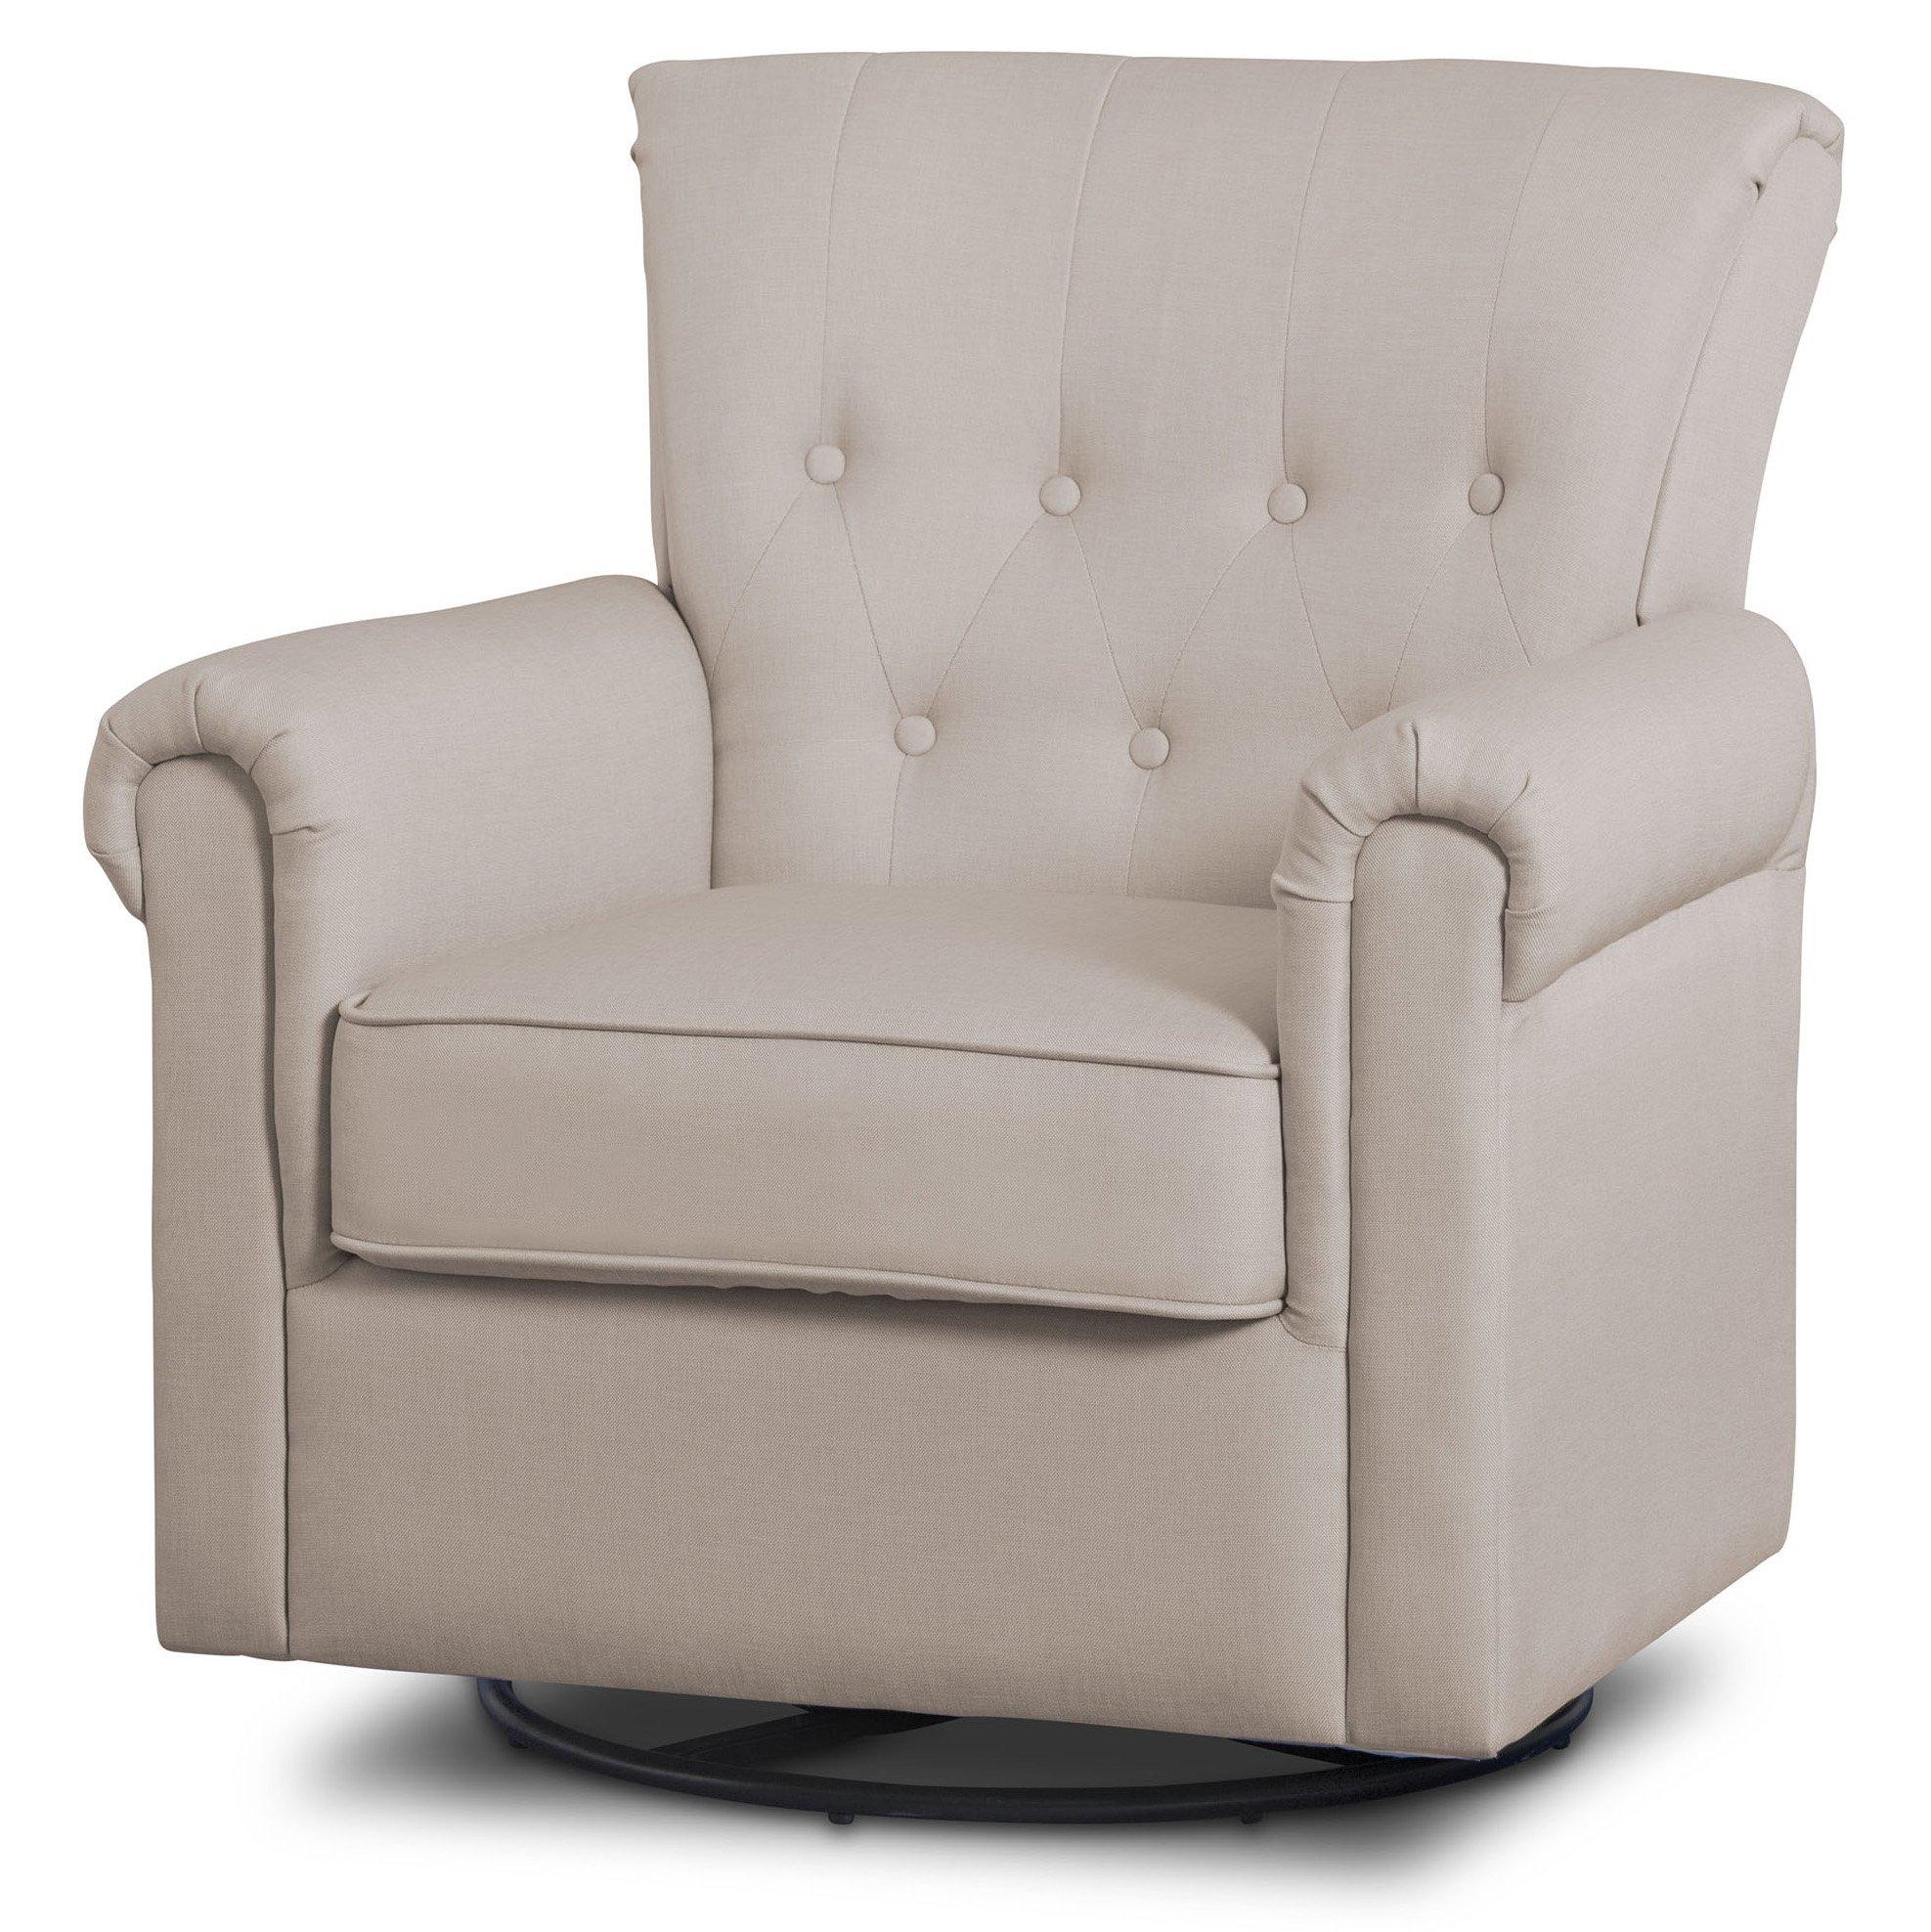 swivel rocking chair parts refurbished kitchen table and chairs cheap glider find get quotations delta children harper rocker flax